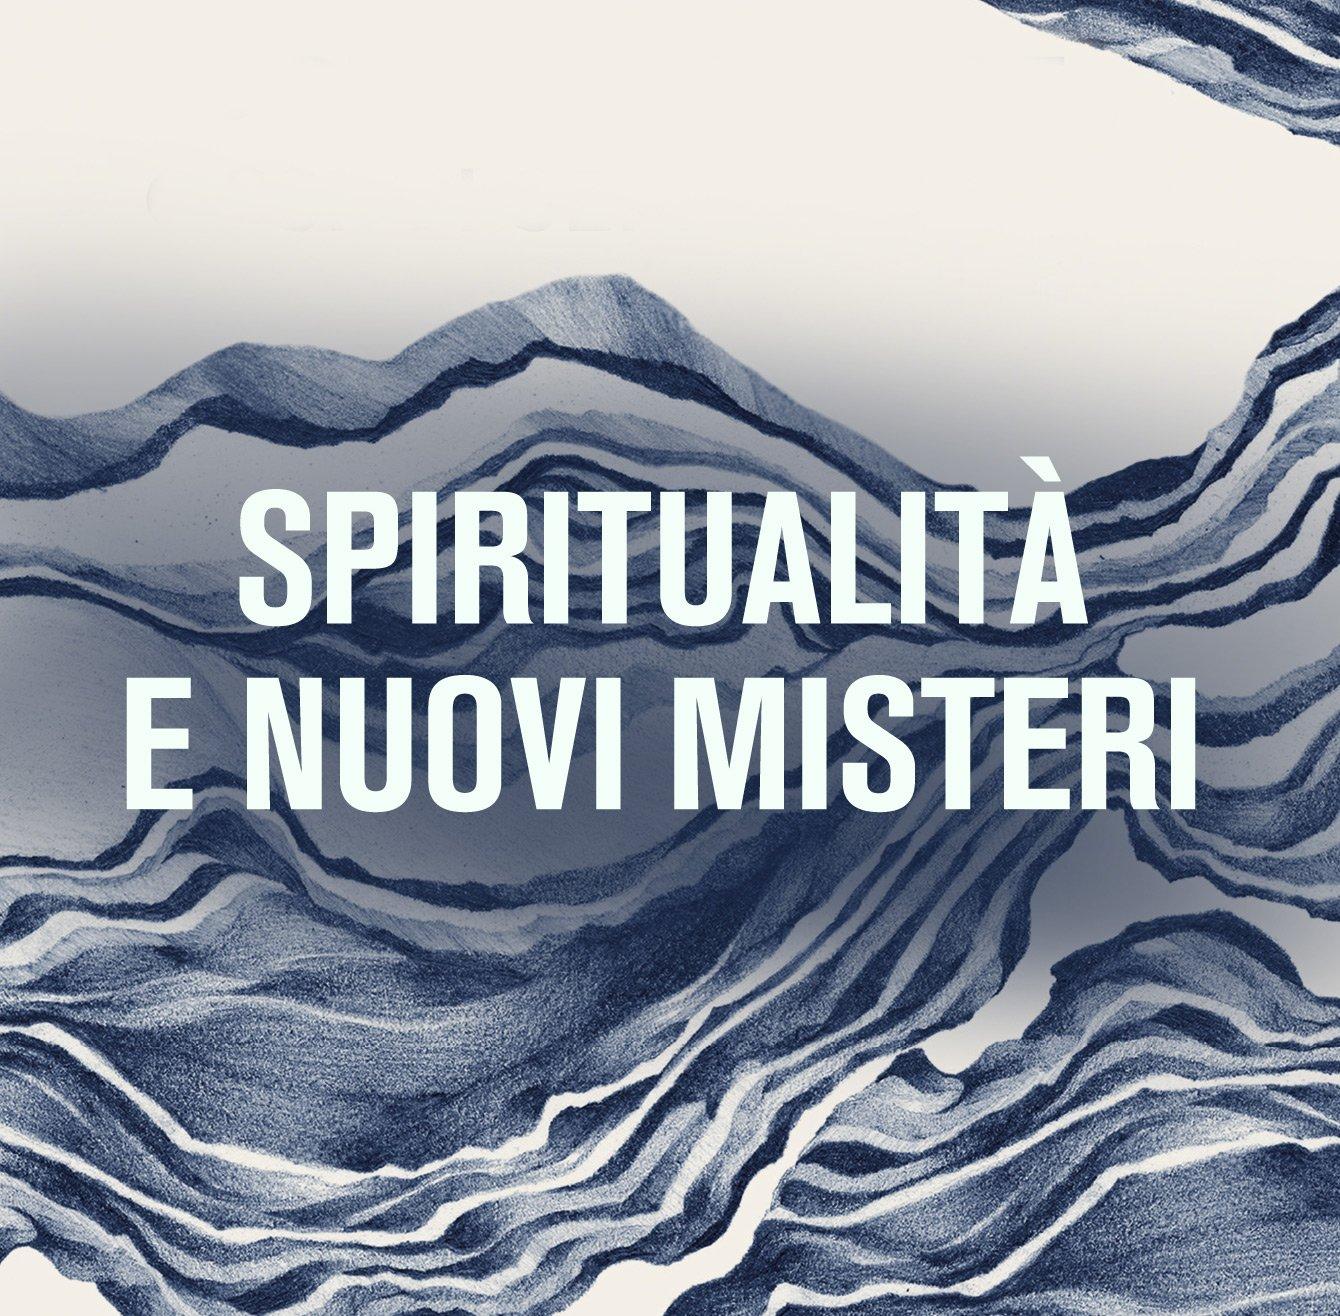 Spiritualità e nuovi misteri